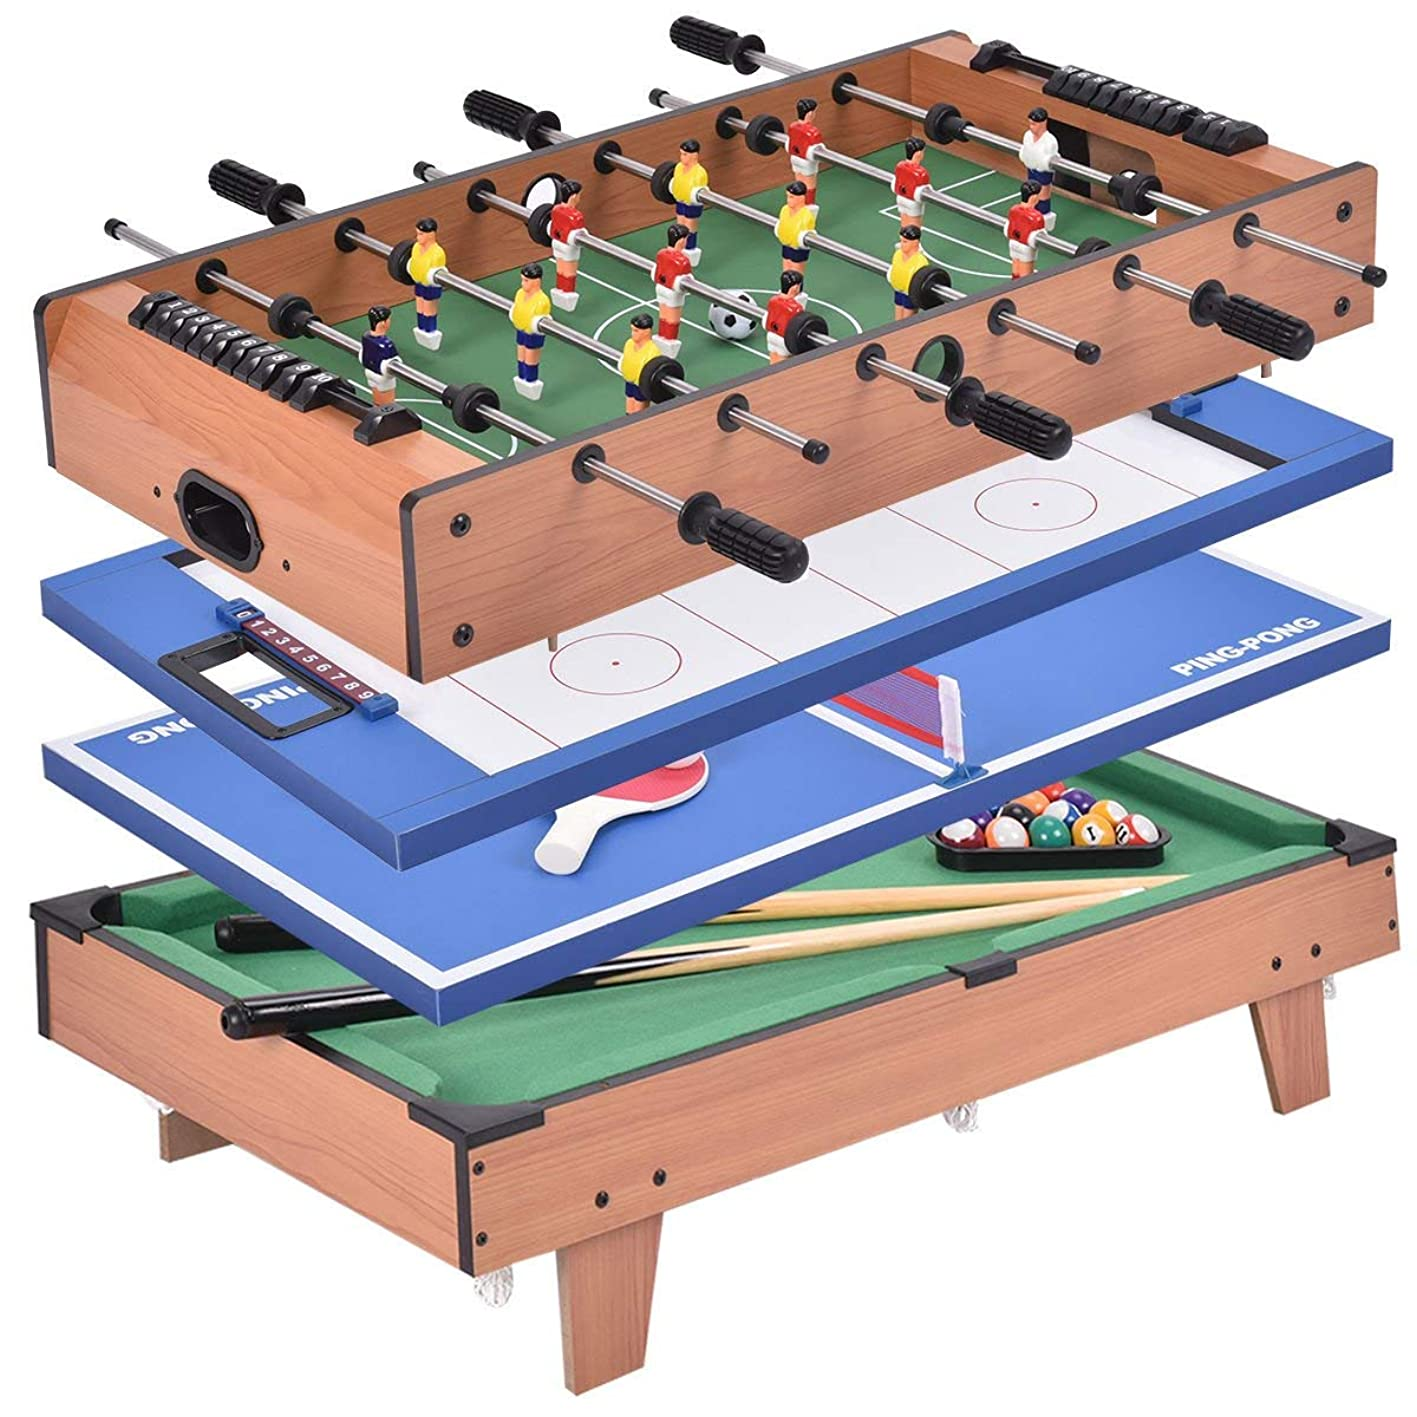 ReunionG 4 in 1 Multi Game Table Including Hockey Foosball Table Tennis Billiard Combination aztyyrudqhx940